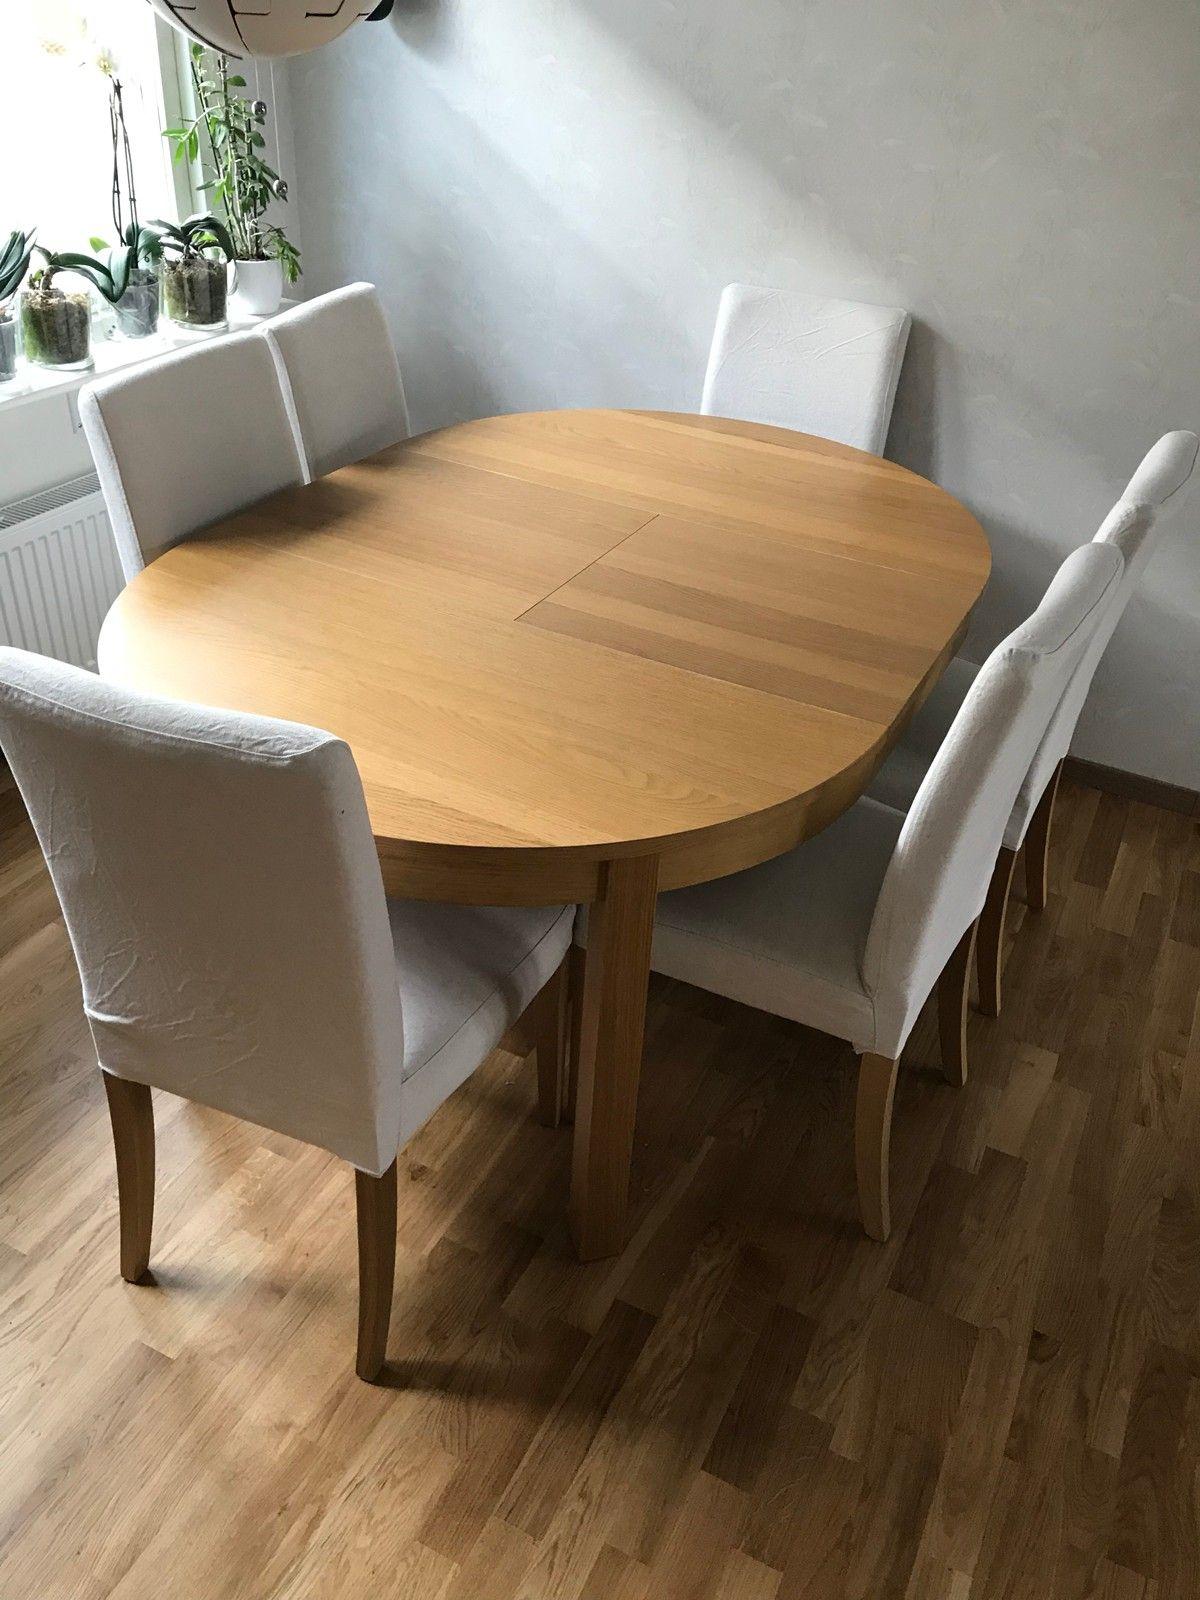 ovalt spisebord med ileggsplate